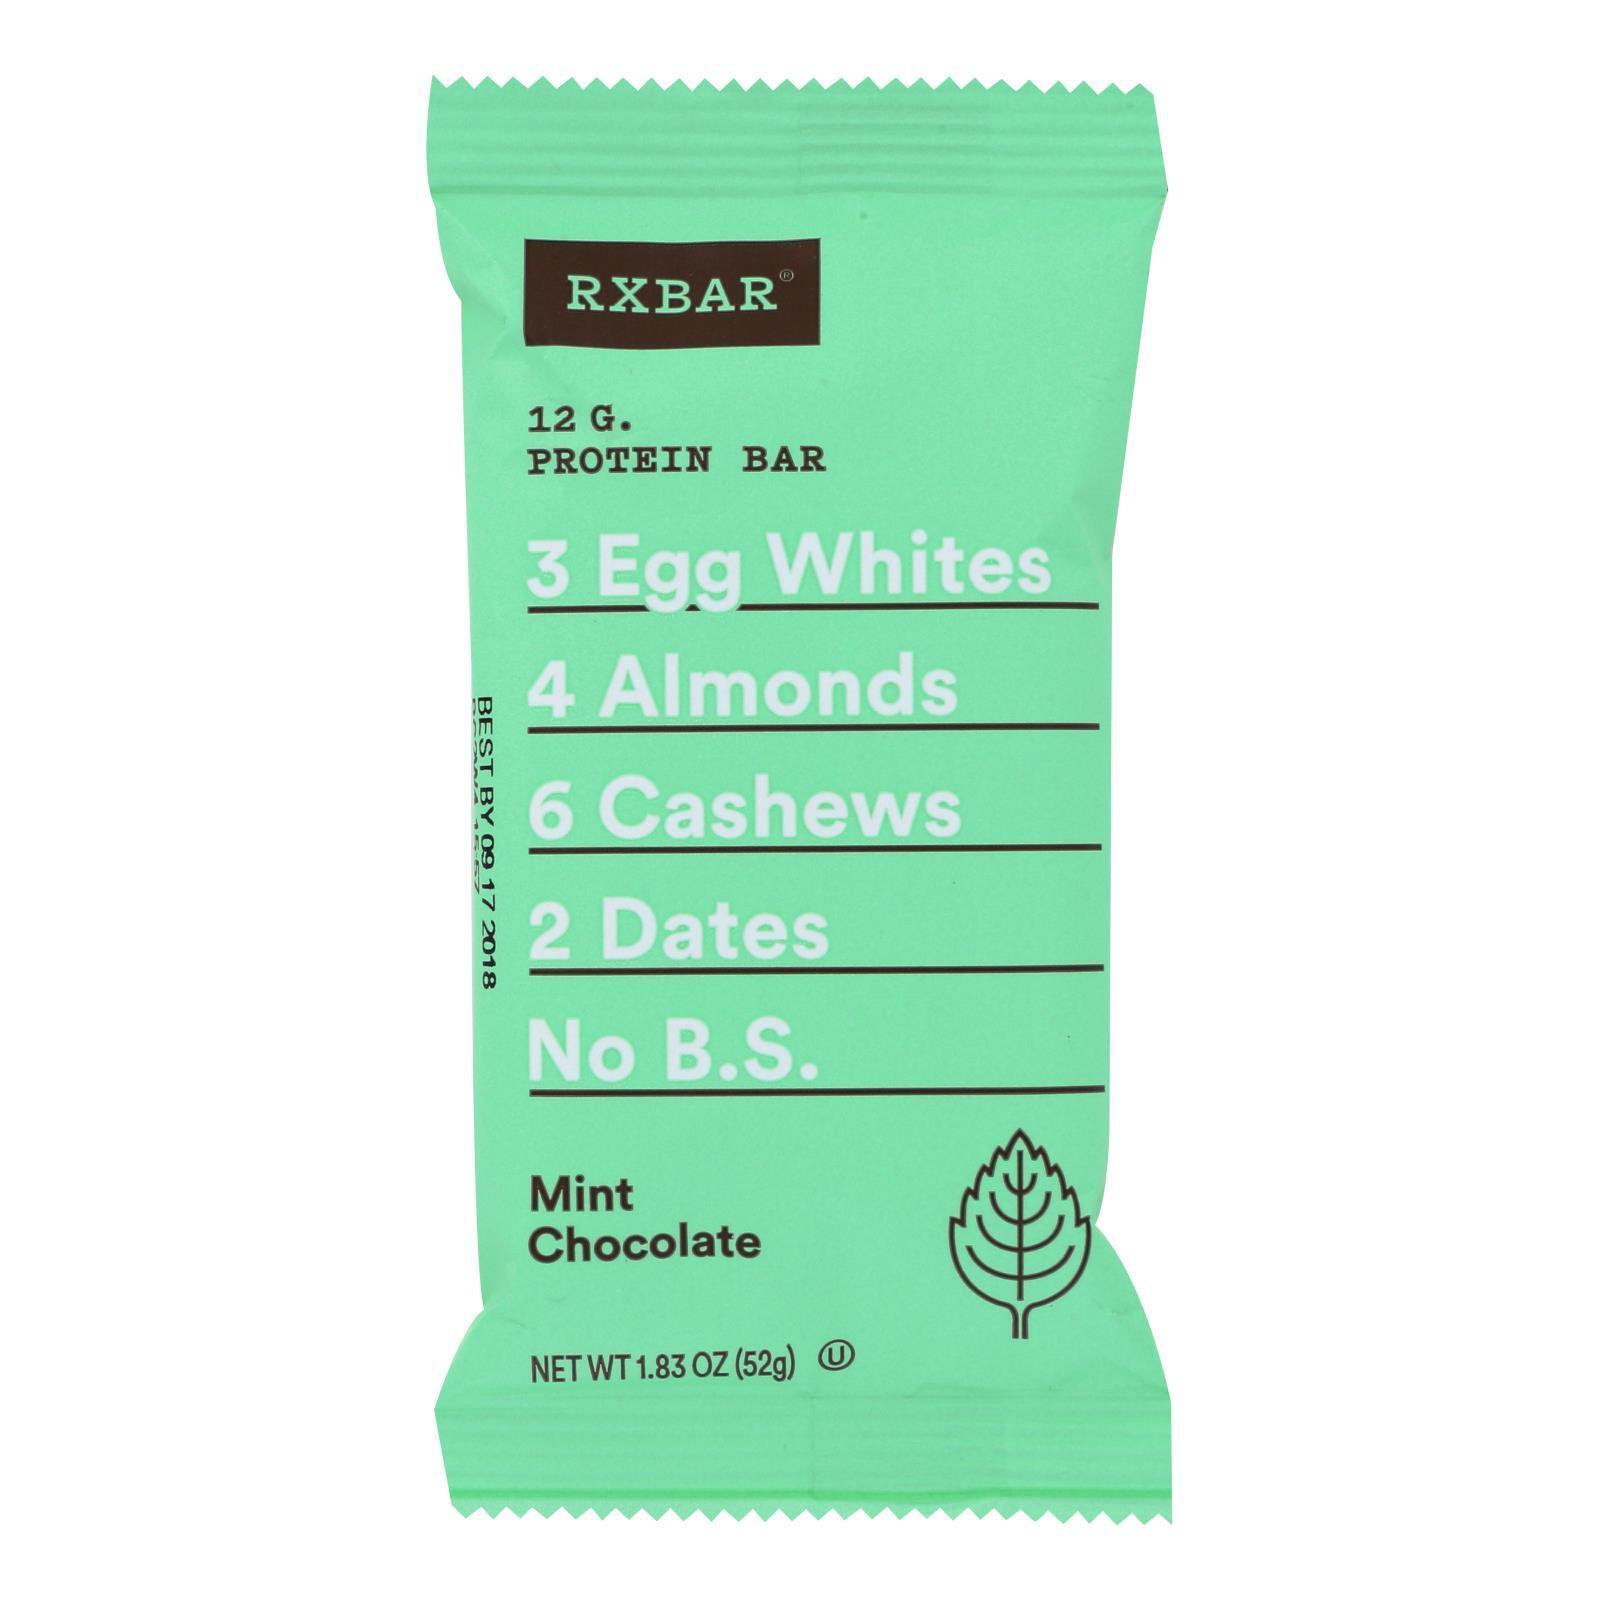 Rxbar Protein Bar - Mint Chocolate - Case of 12 - 1.83 oz.